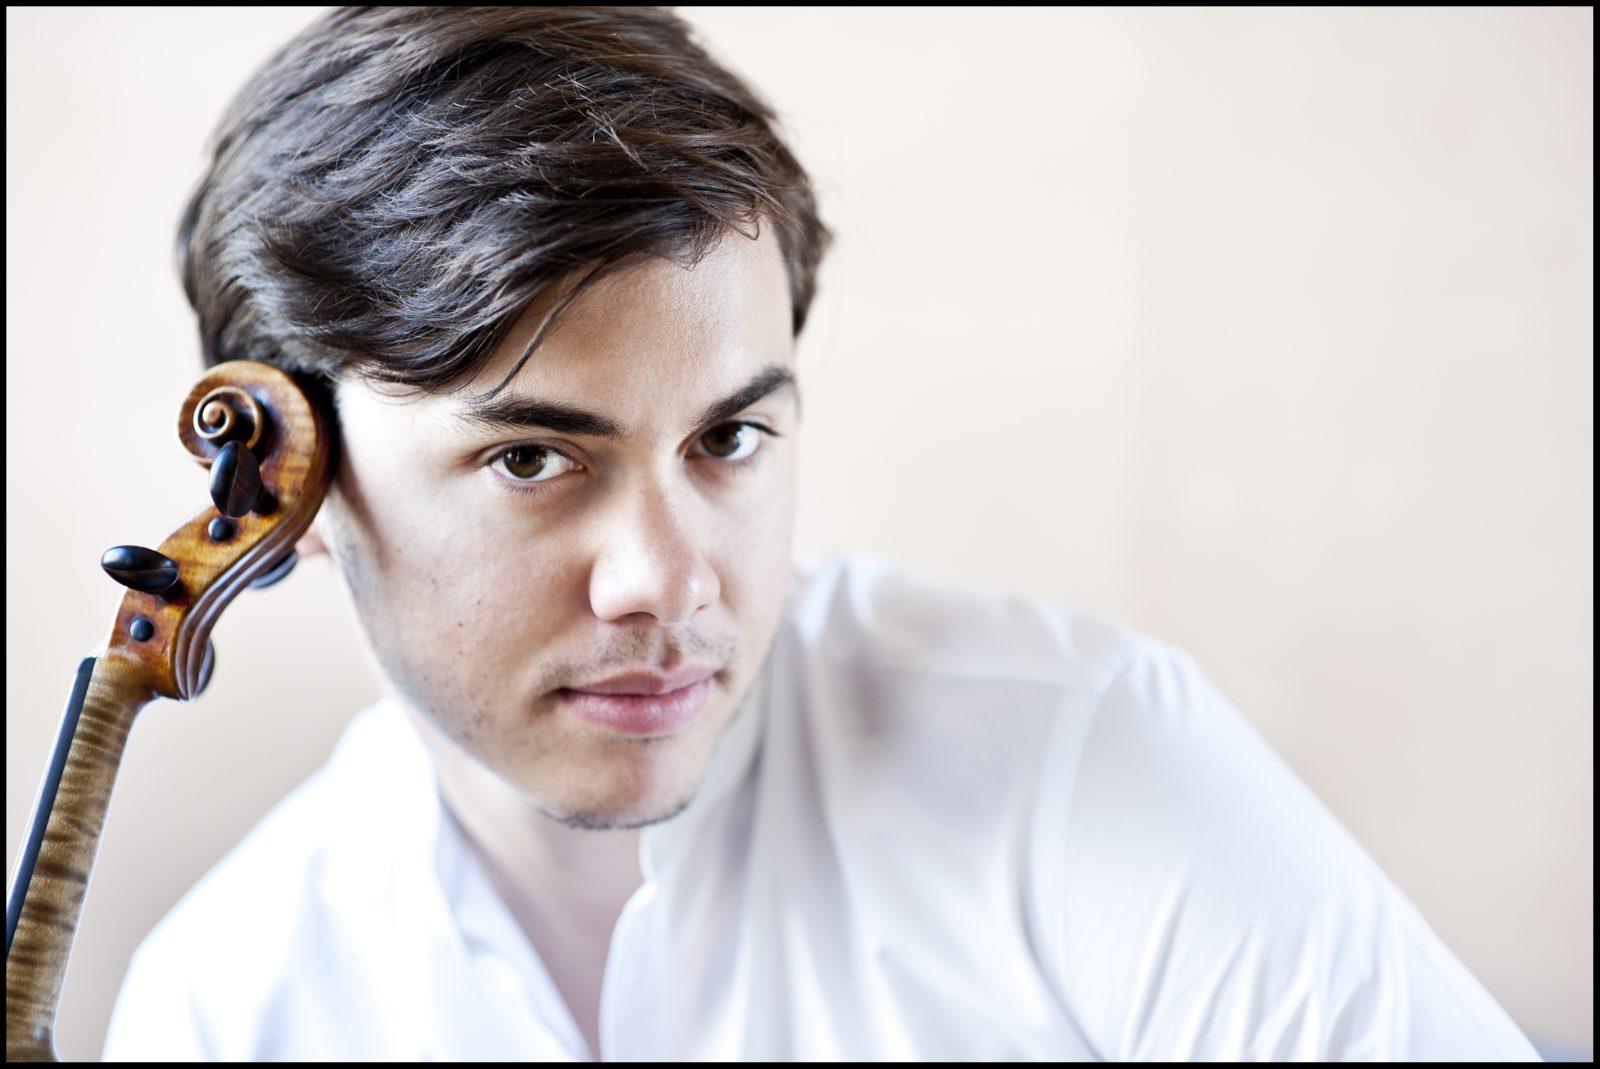 Benjamin Beilman is ready to shine again at Kleinhans Music Hall. (Photo by Giorgia-Bertazzi)